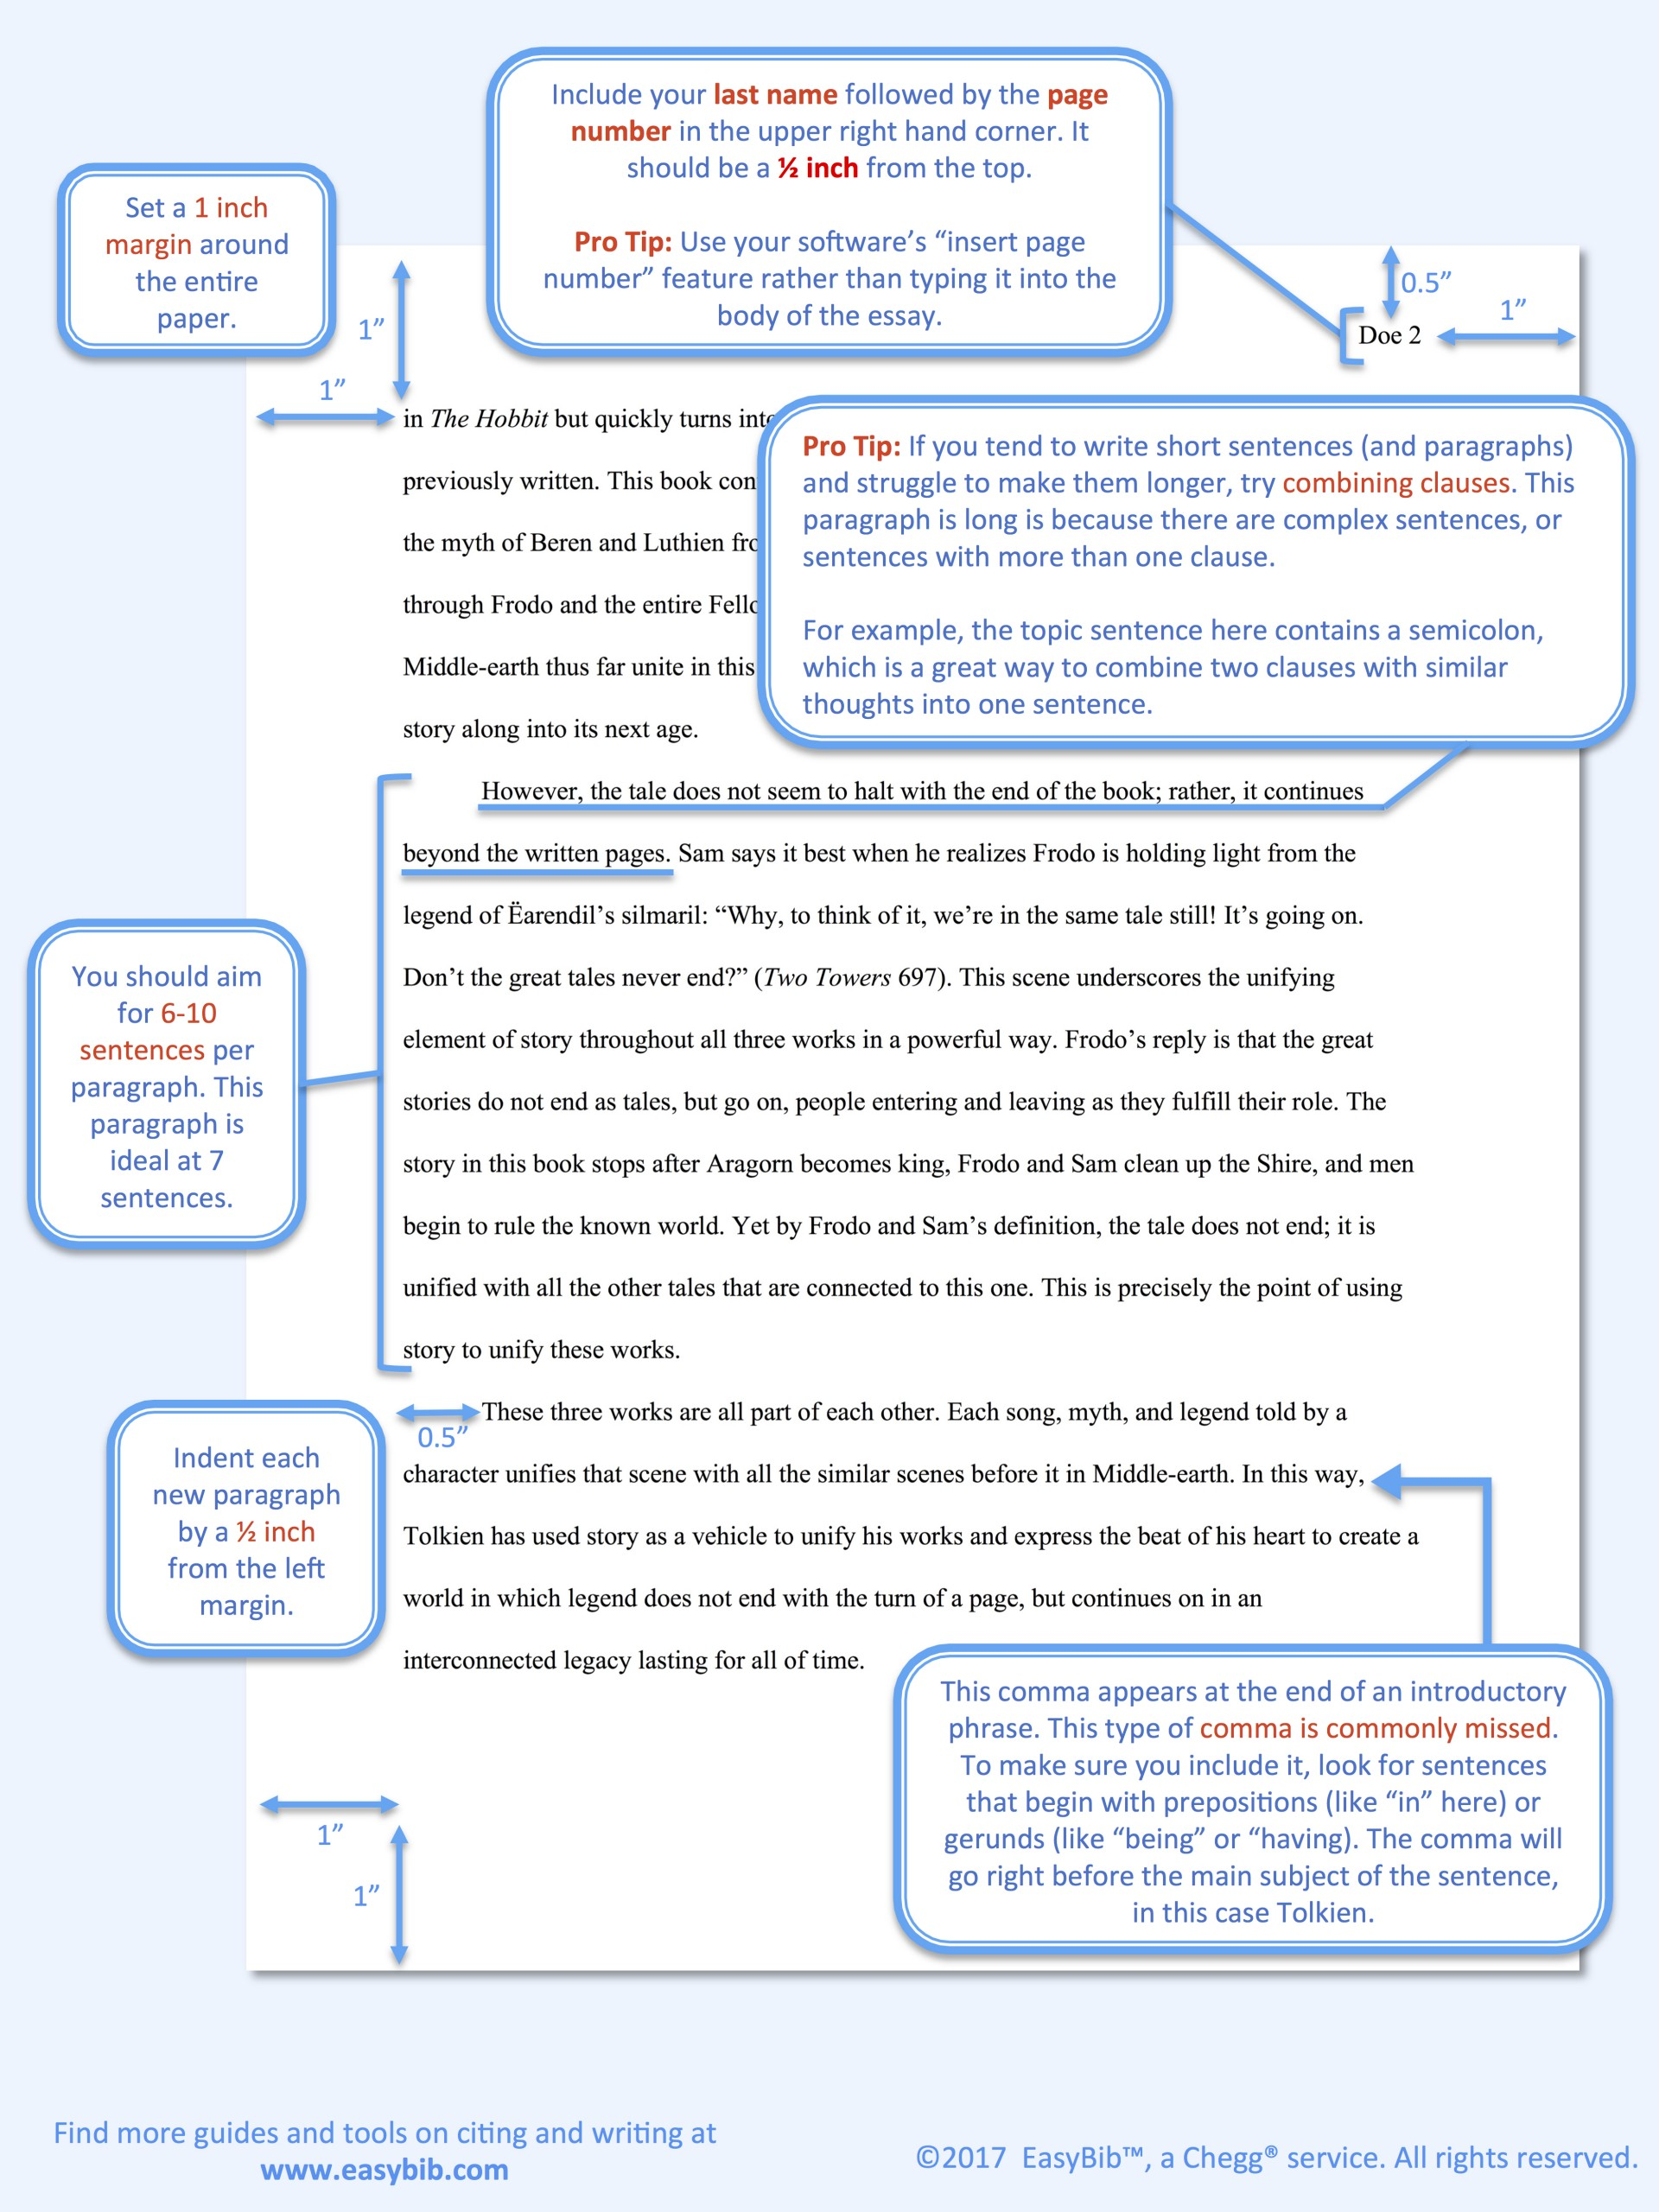 015 Proper Essay Form Example Model Mla Paper Formidable Format Reflection 1920